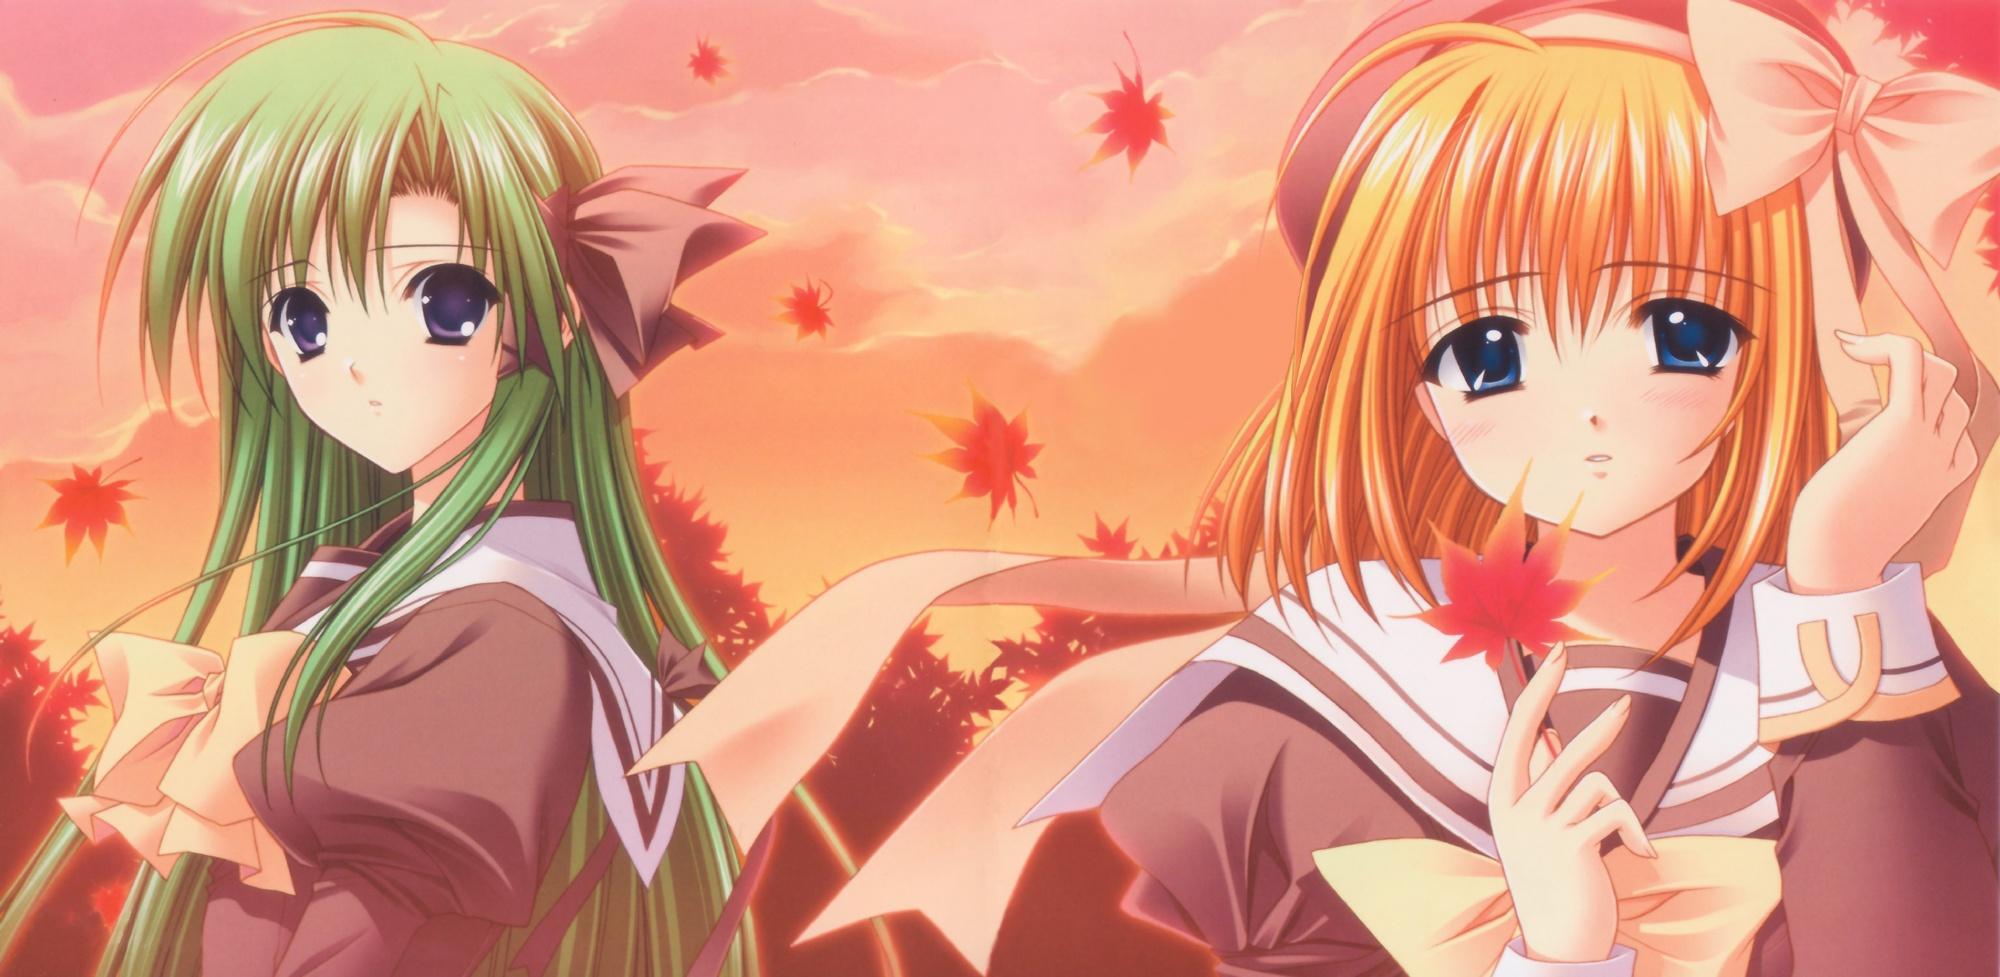 2girls autumn blue_eyes bow clouds fuyou_kaede green_hair hat headband leaves orange_hair purple_eyes ribbons school_uniform shigure_asa shuffle sky